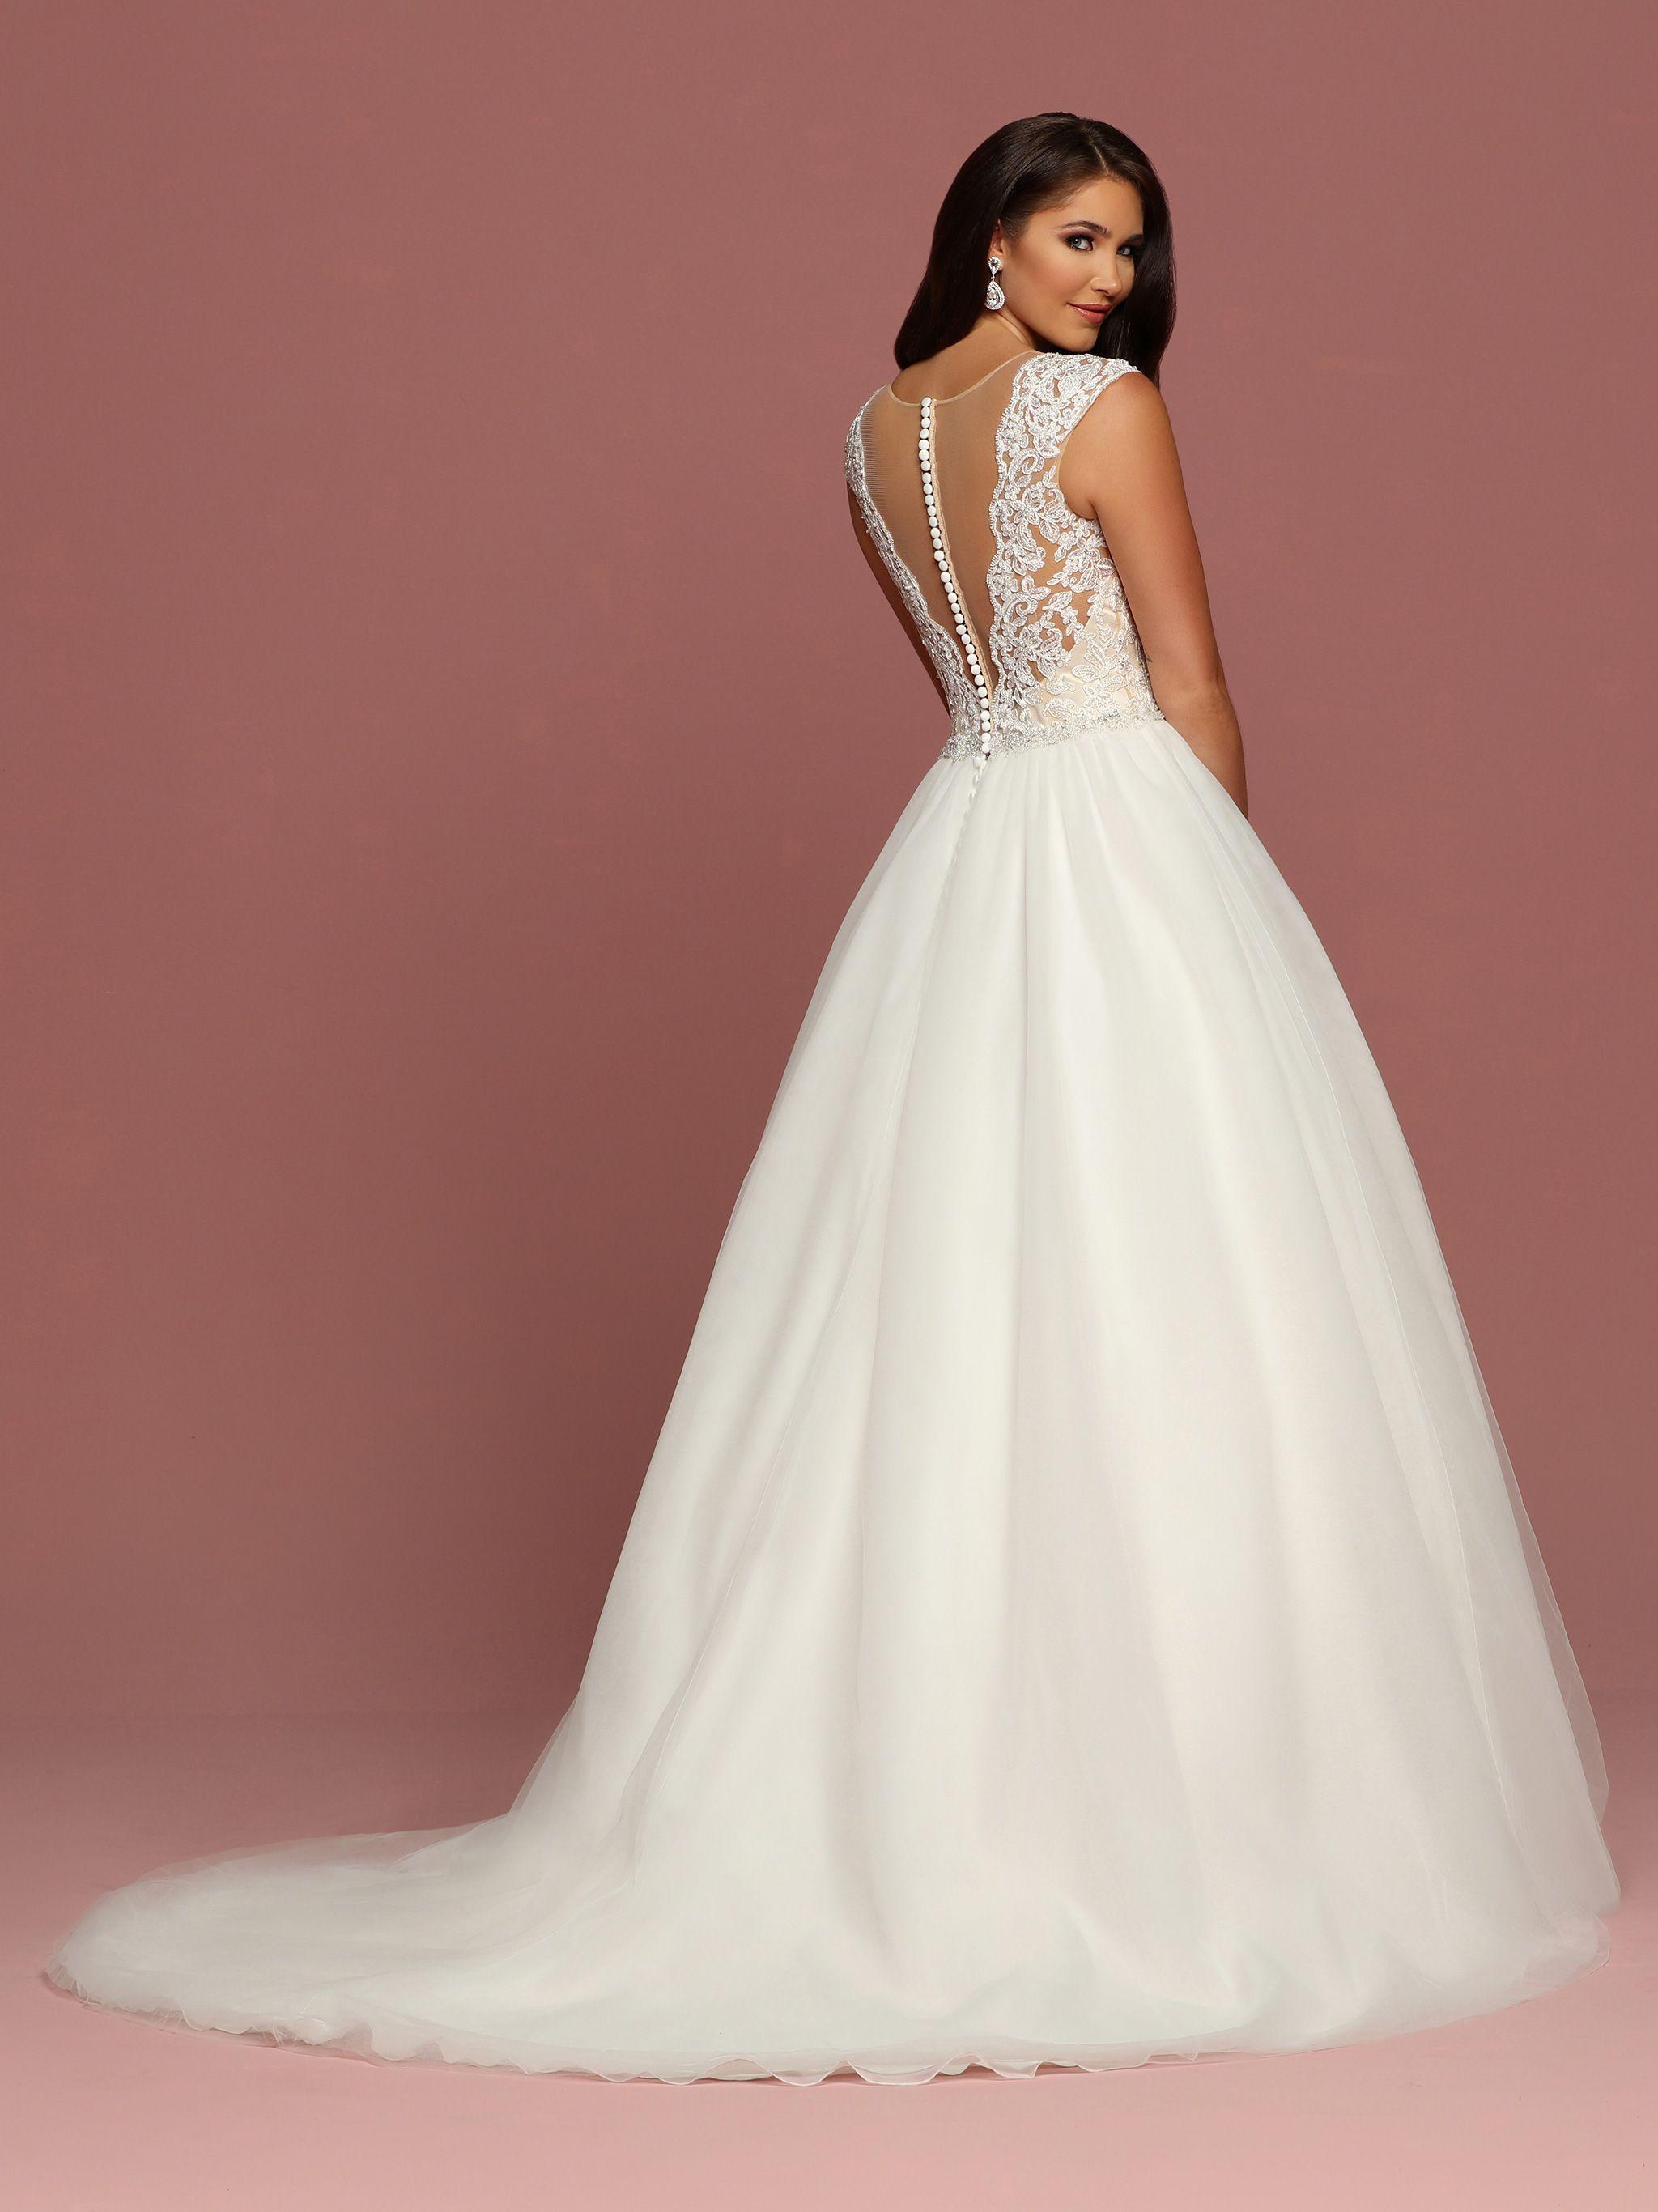 Davinci bridal style davinci bridal pinterest davinci